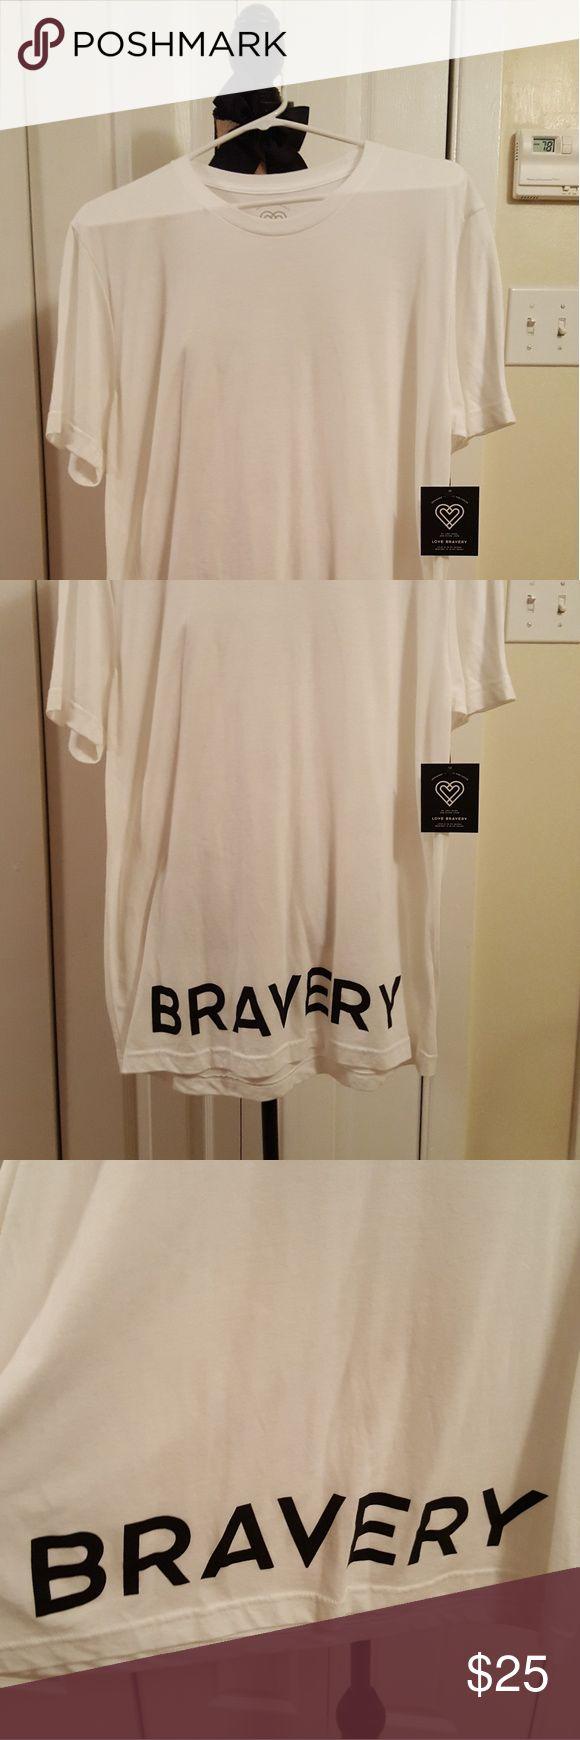 Lady Gaga and Elton John T-Shirt White Bravery Cotton T-Shirt Love Bravery Tops Tees - Short Sleeve